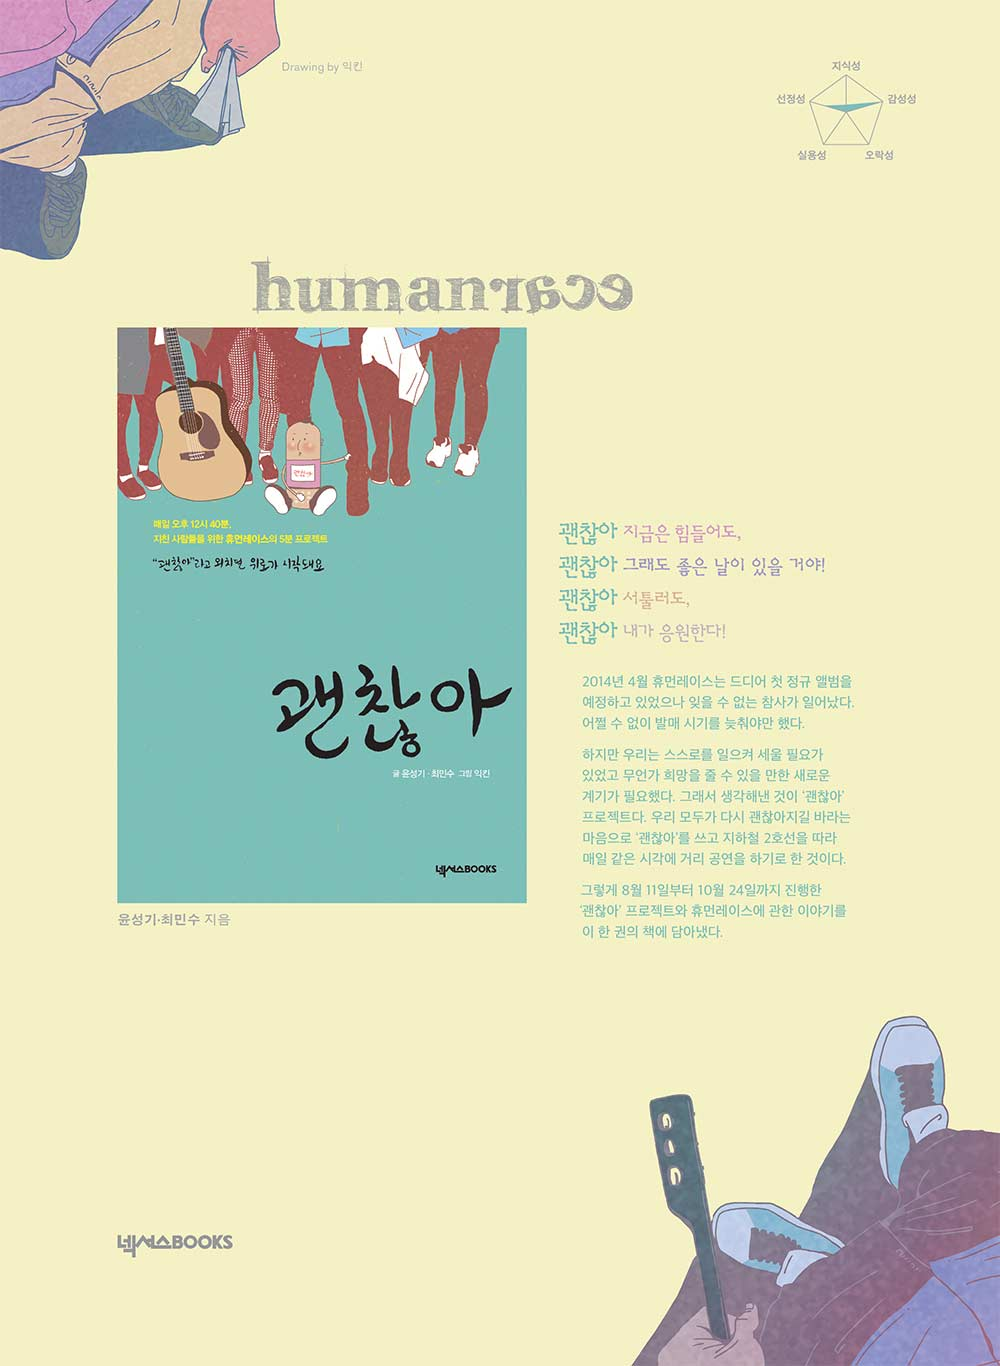 04_interview_book_02